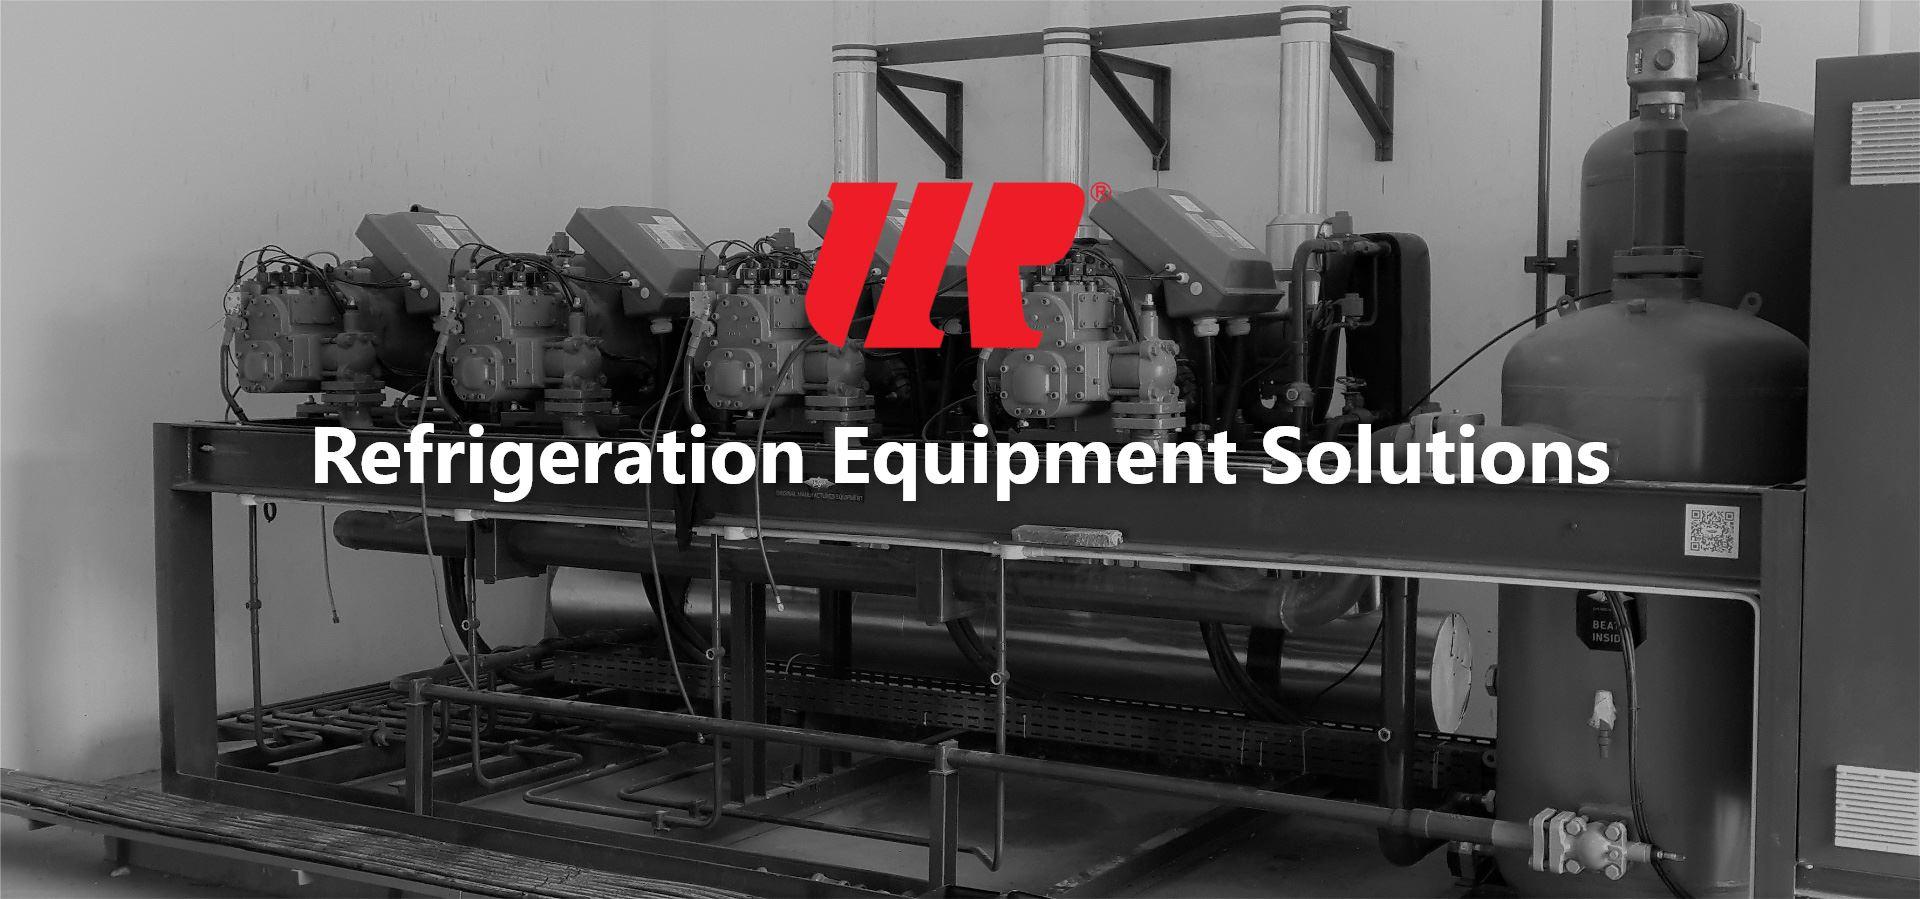 UR Refrigeration Equipment Solutions Johor KL Malaysia